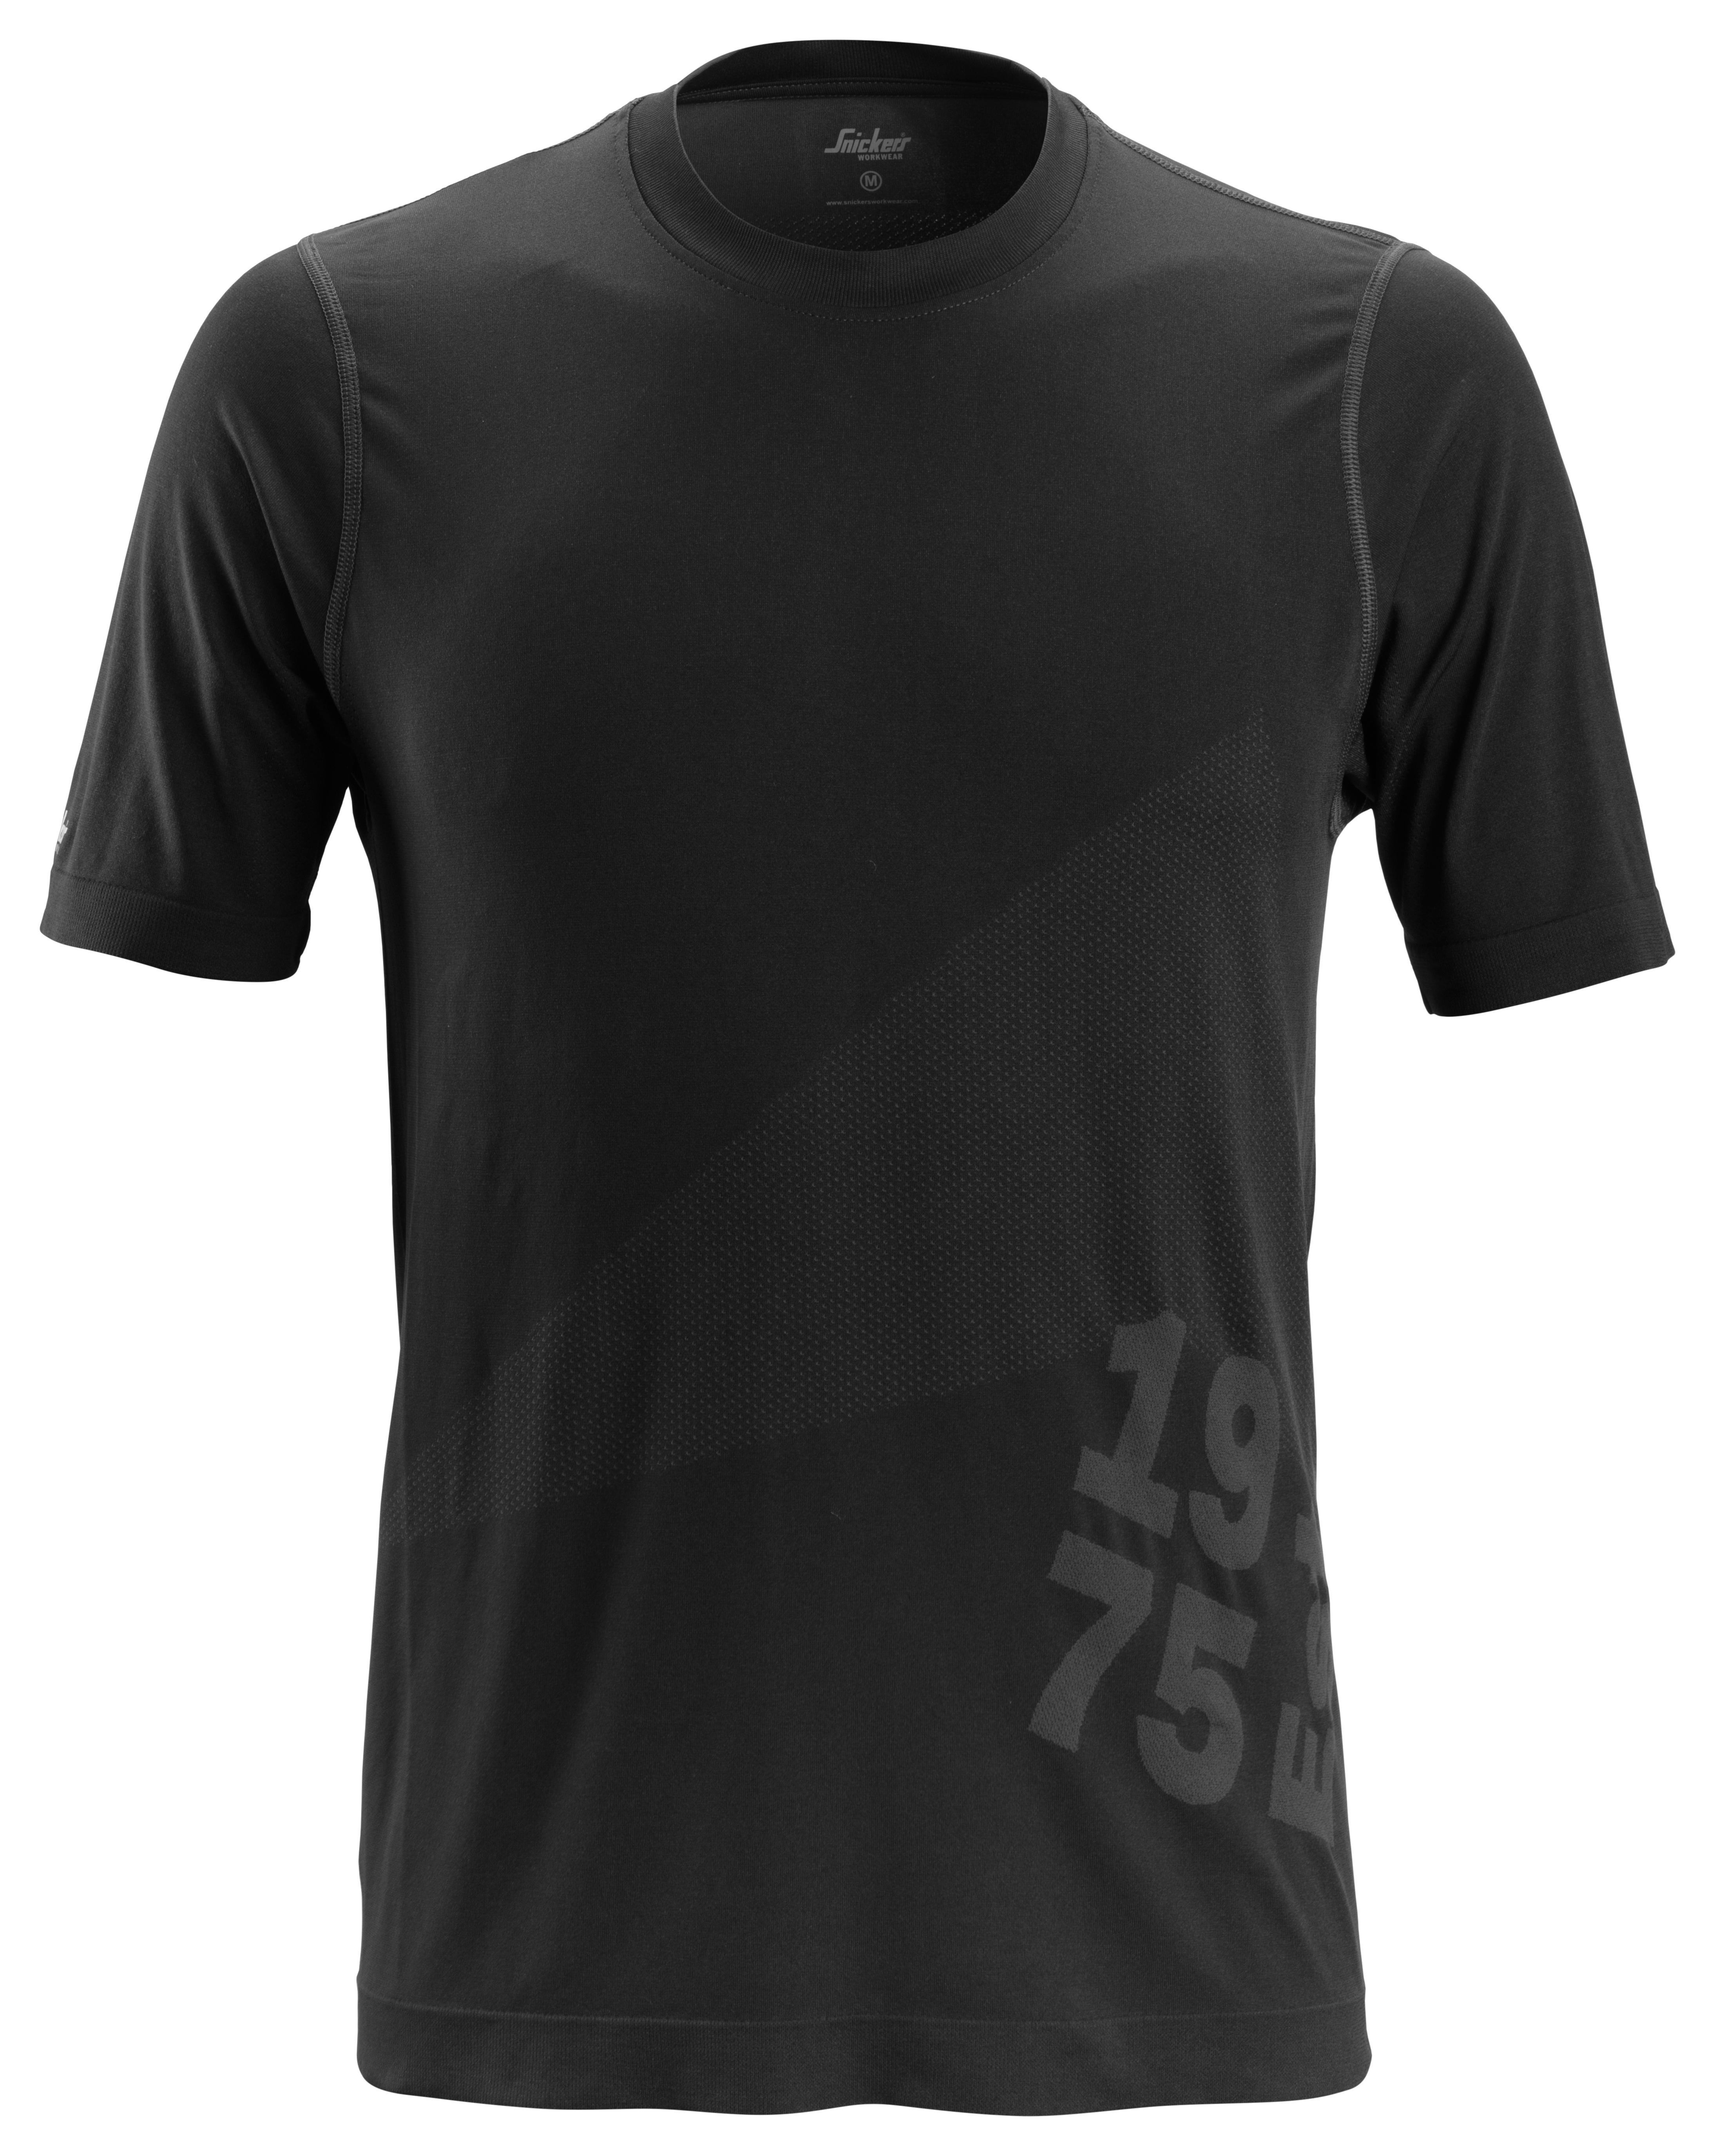 Snickers 2517 - AllroundWork T-shirt fem. coton bio